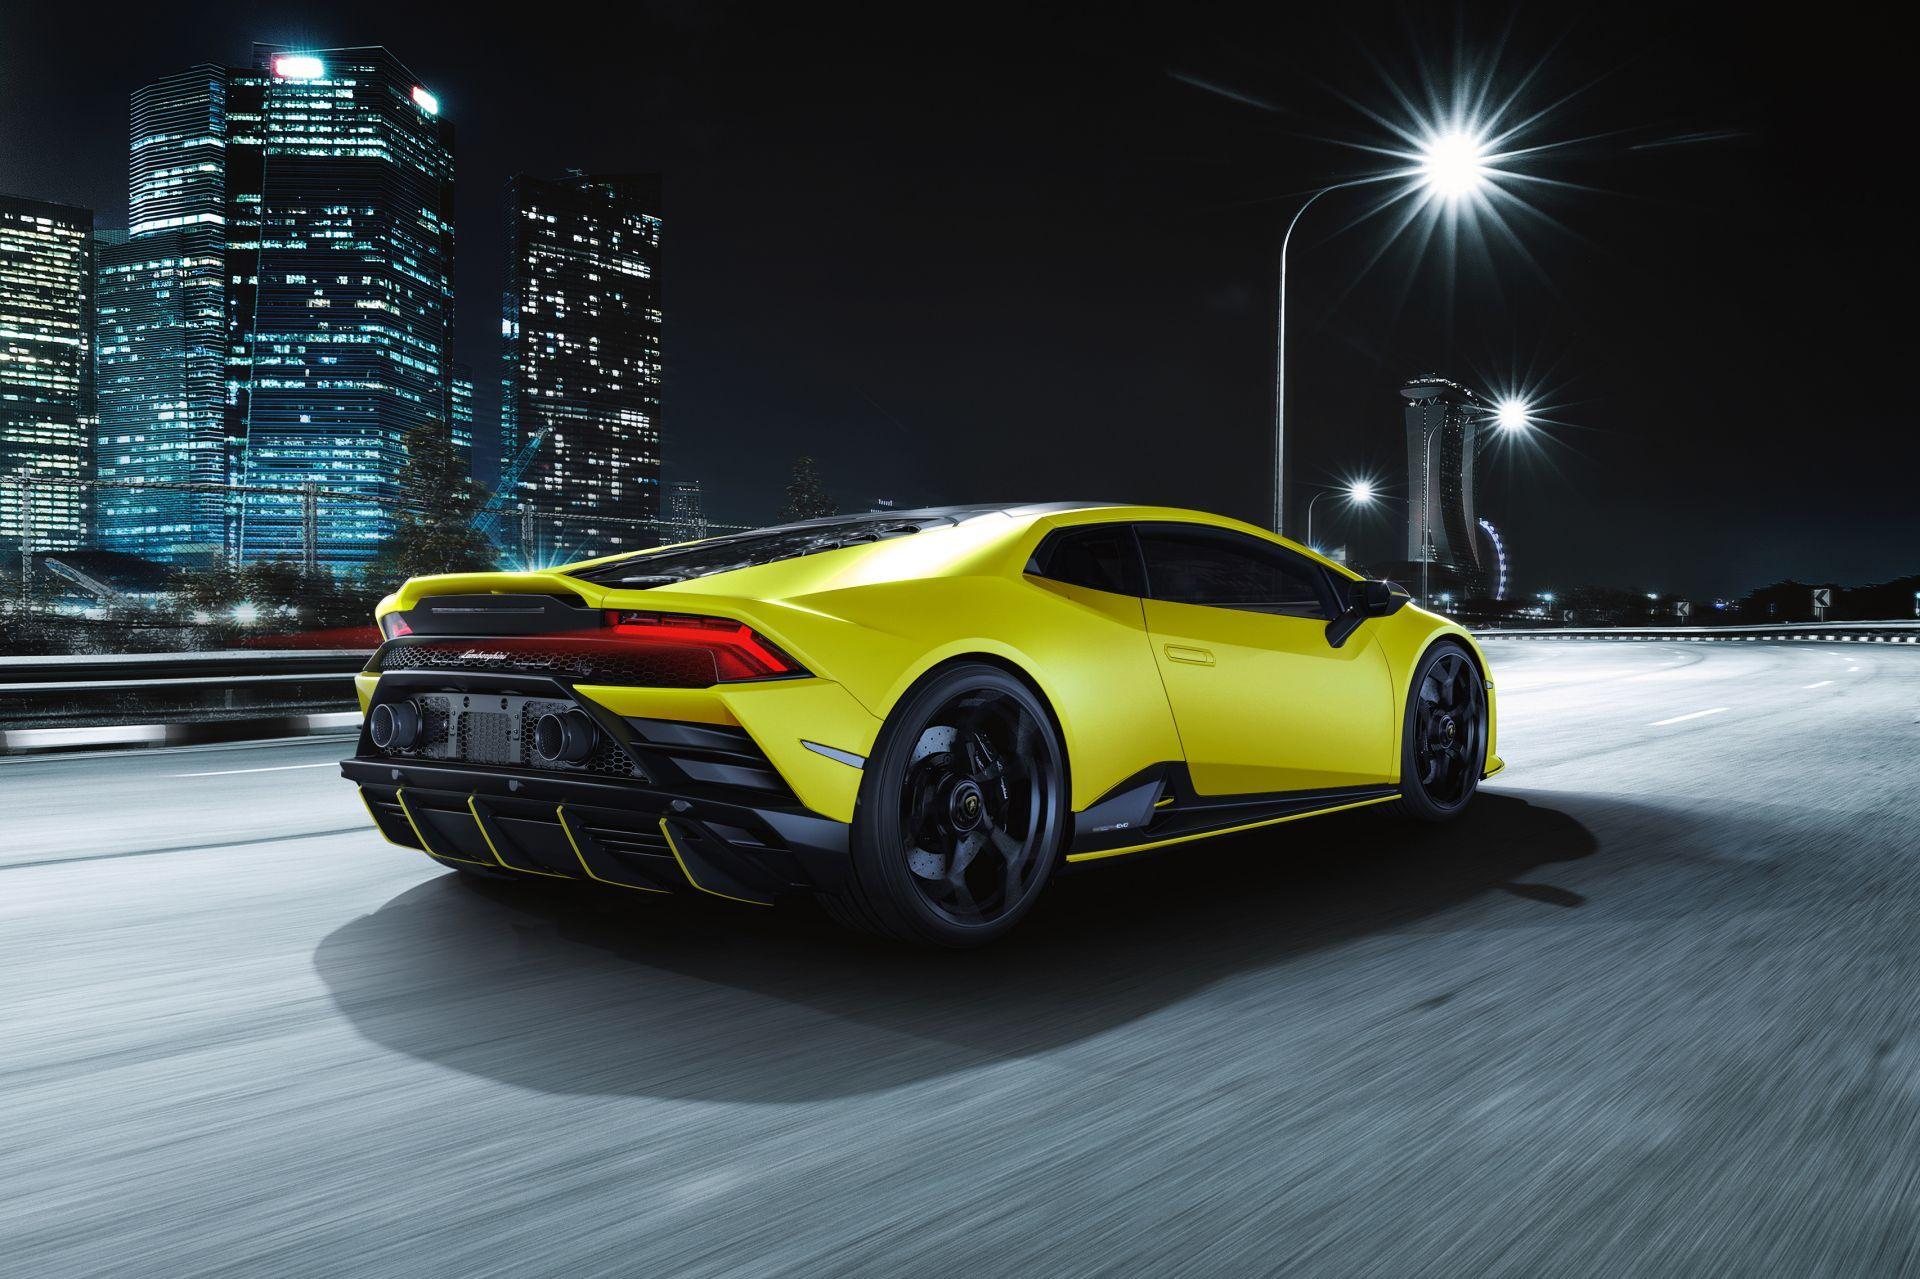 Lamborghini-Huracan-Evo-Fluo-Capsule-2